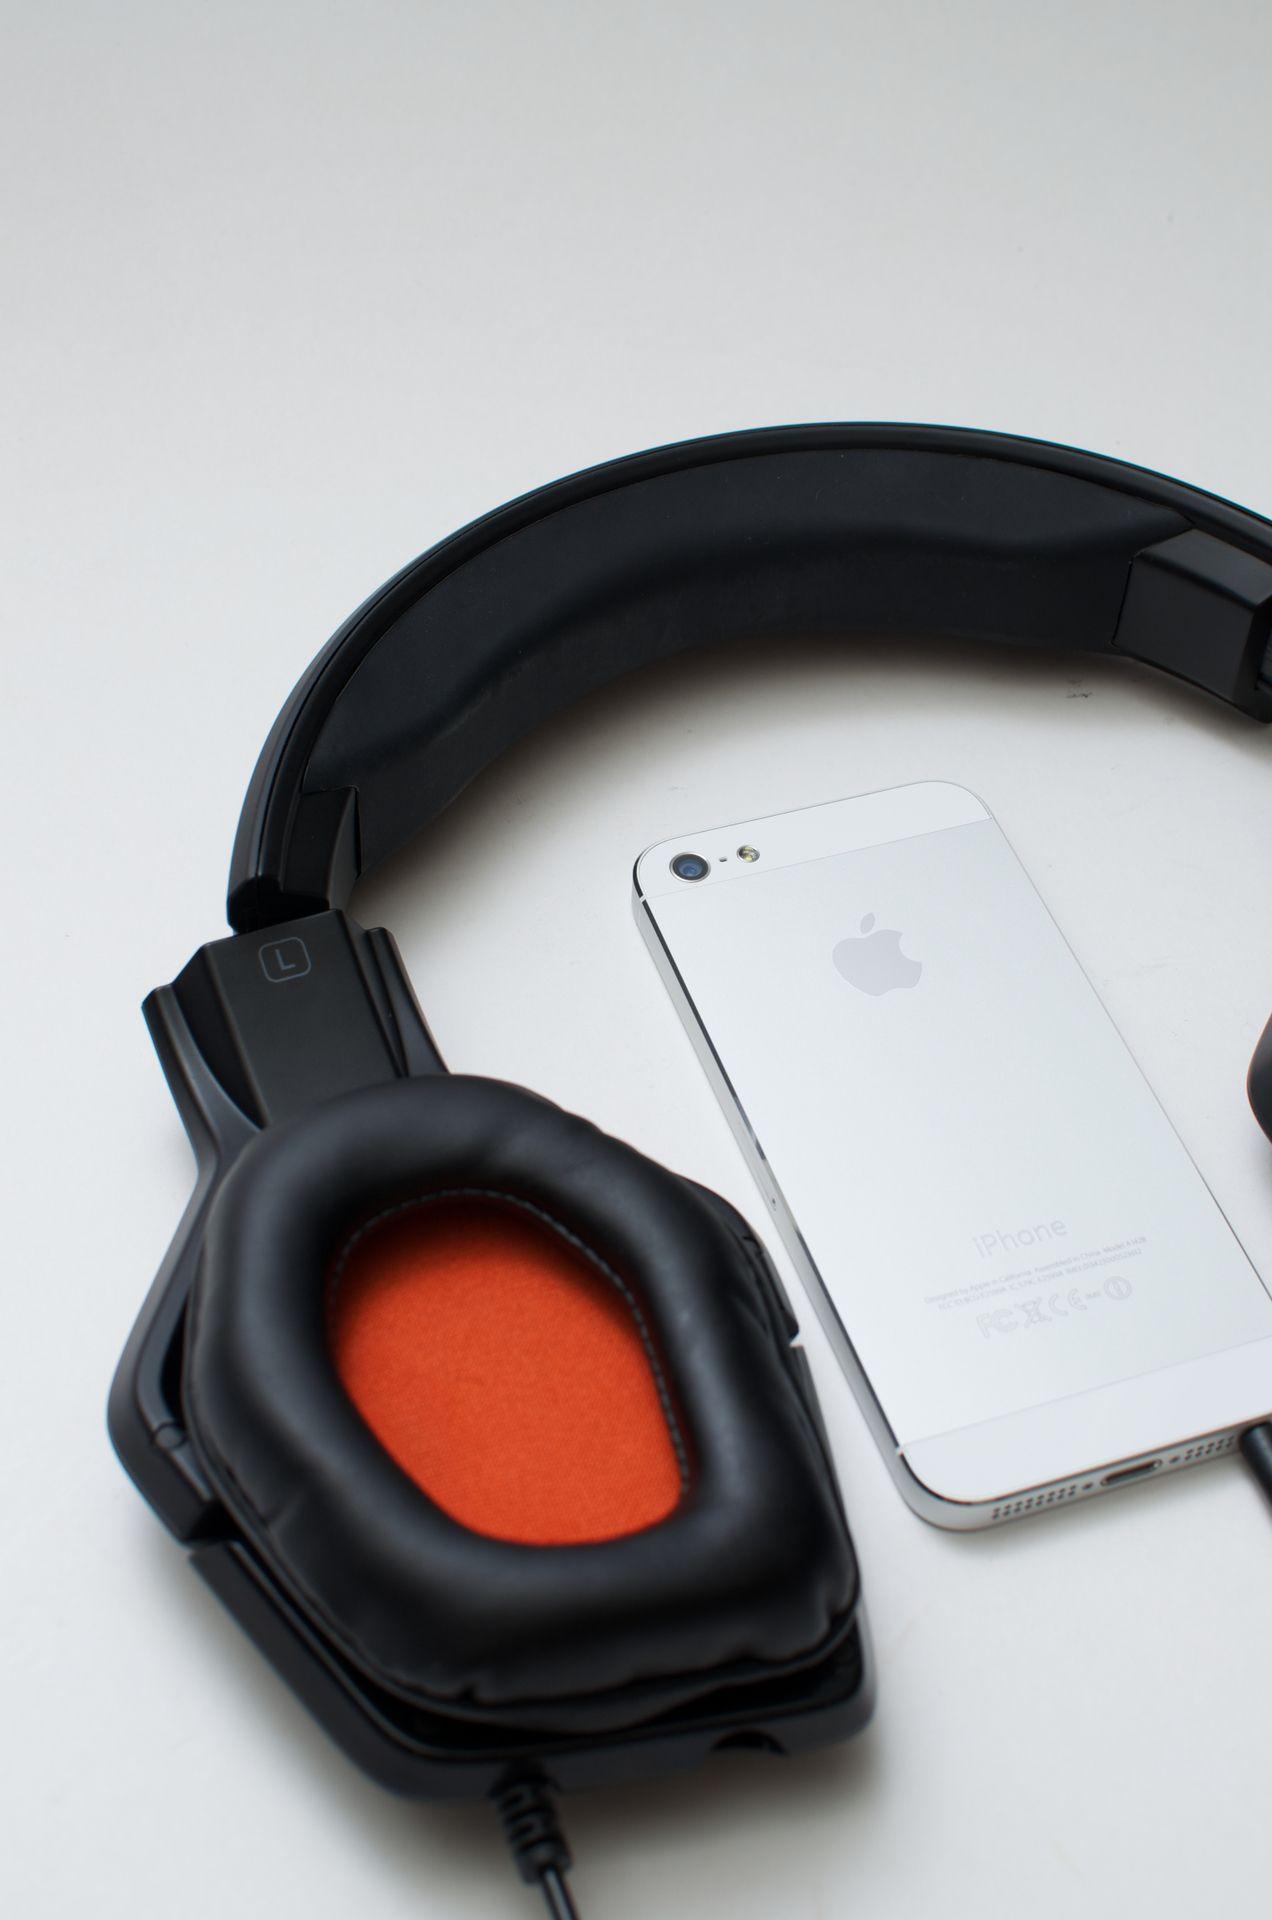 30 Outstanding Examples Of Gear And Gadget Photography Gadgets Best Headphones Apple Design